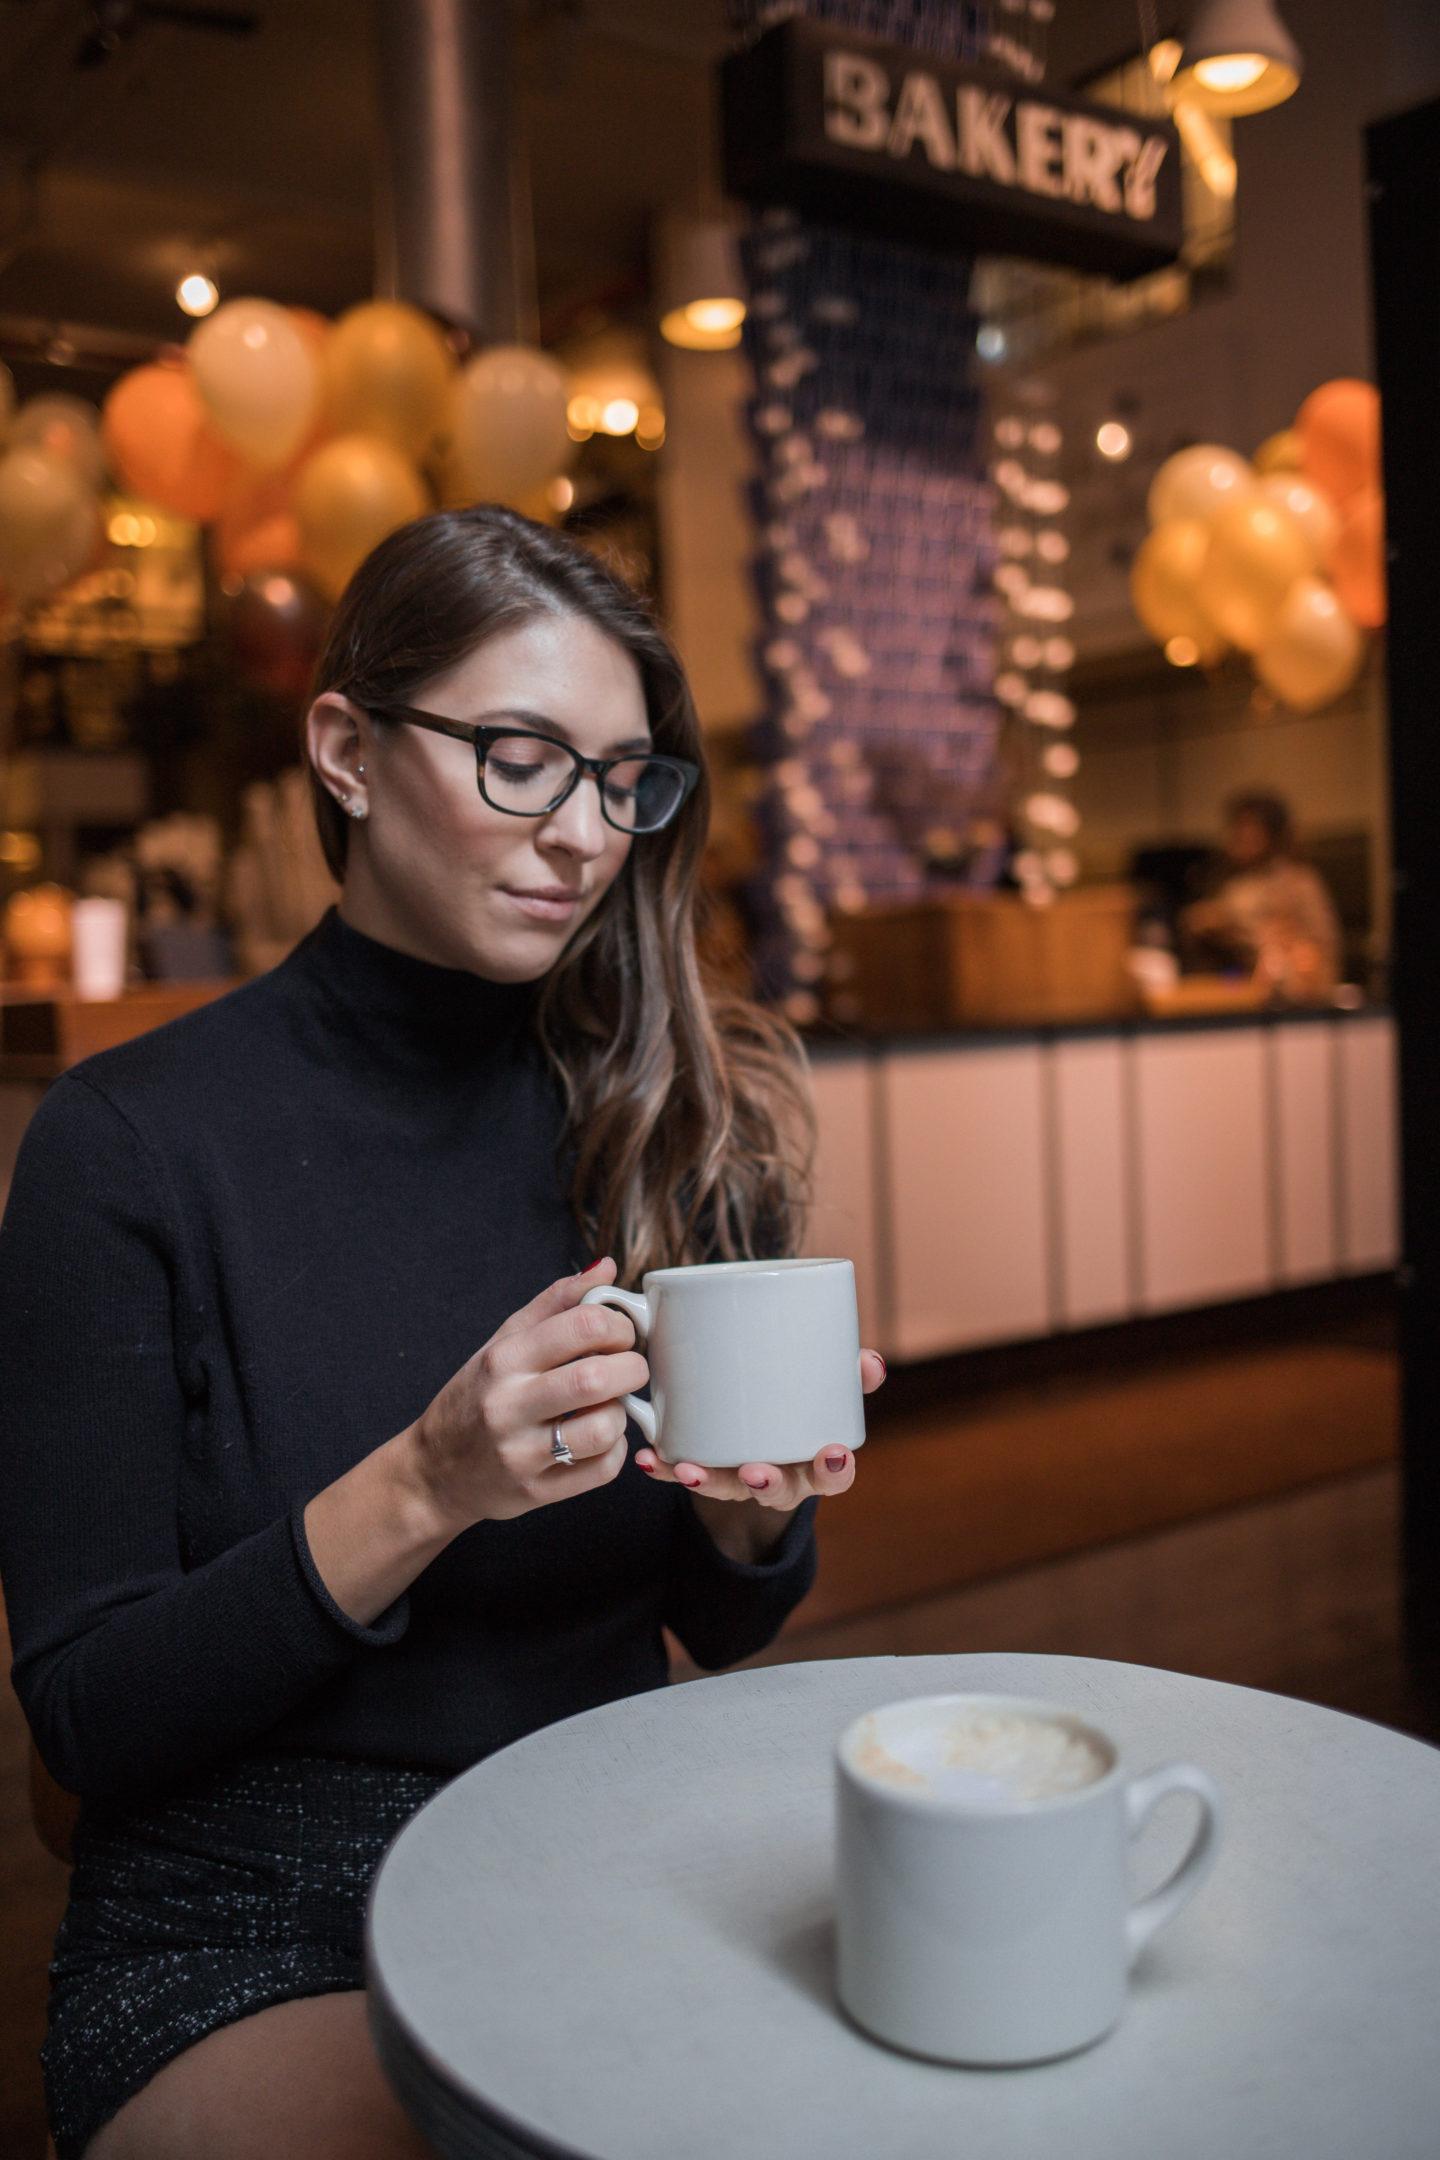 Hot Chocolate at City Bakery